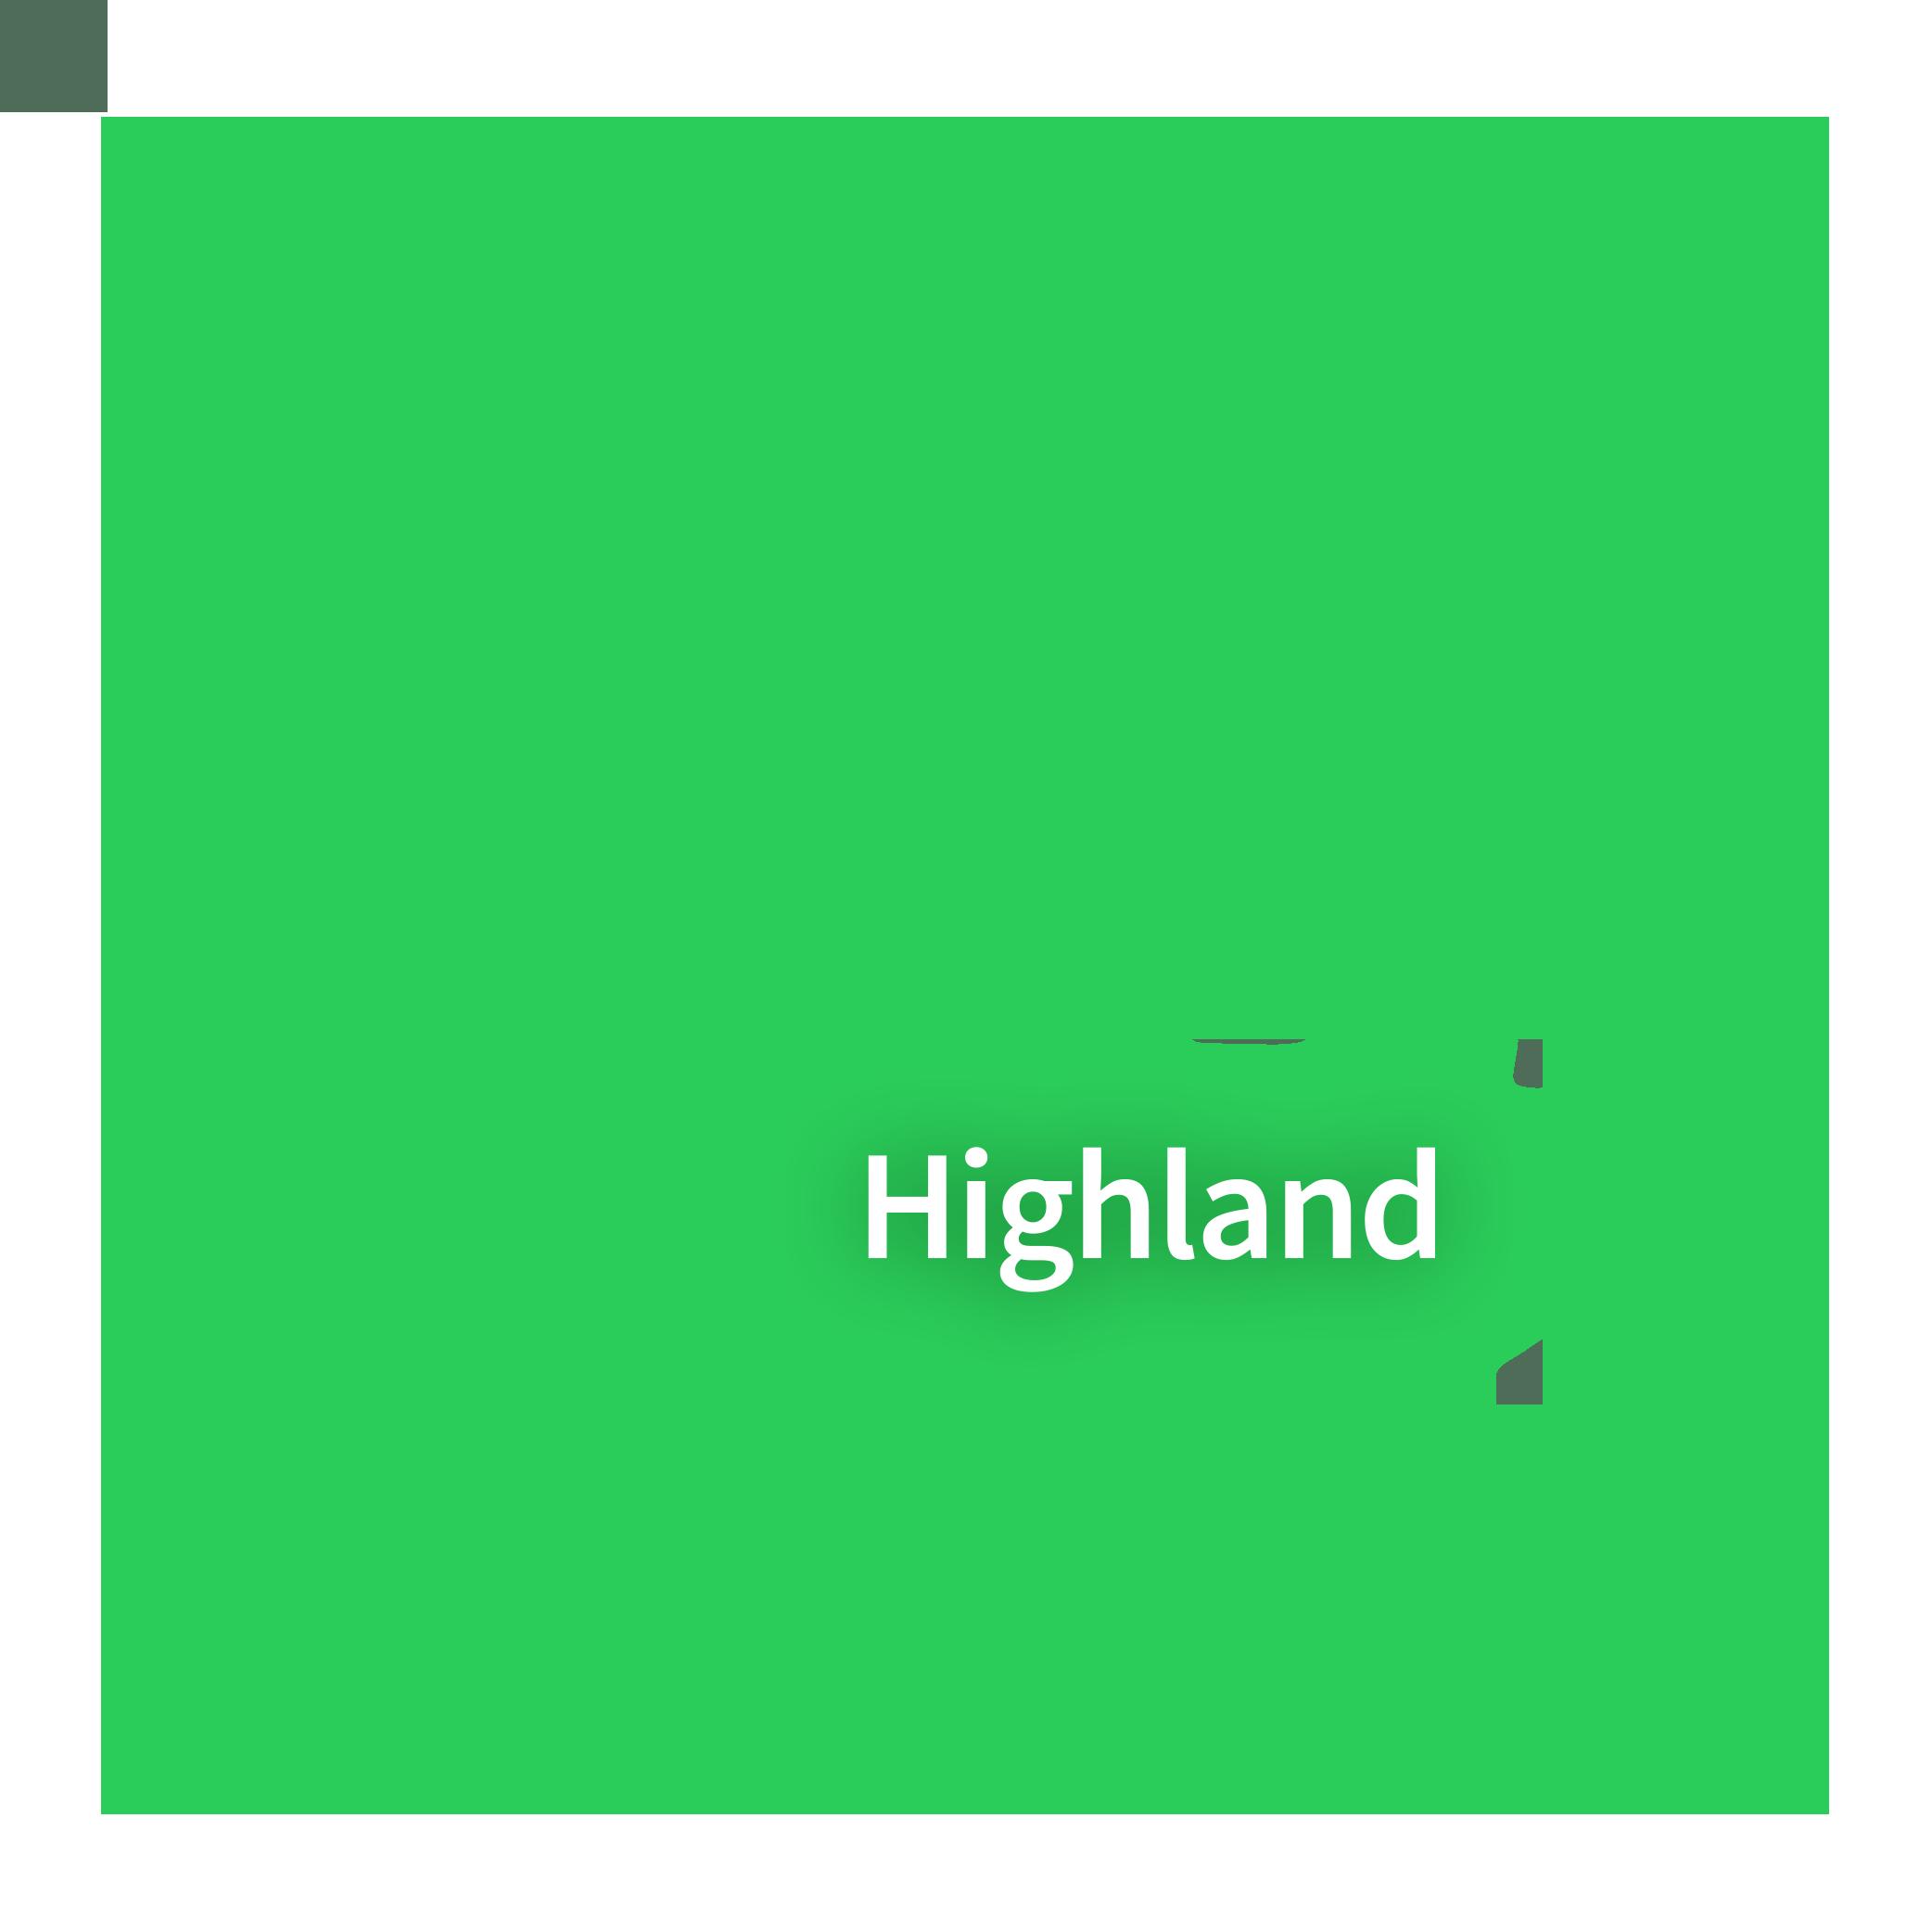 Map of Highland